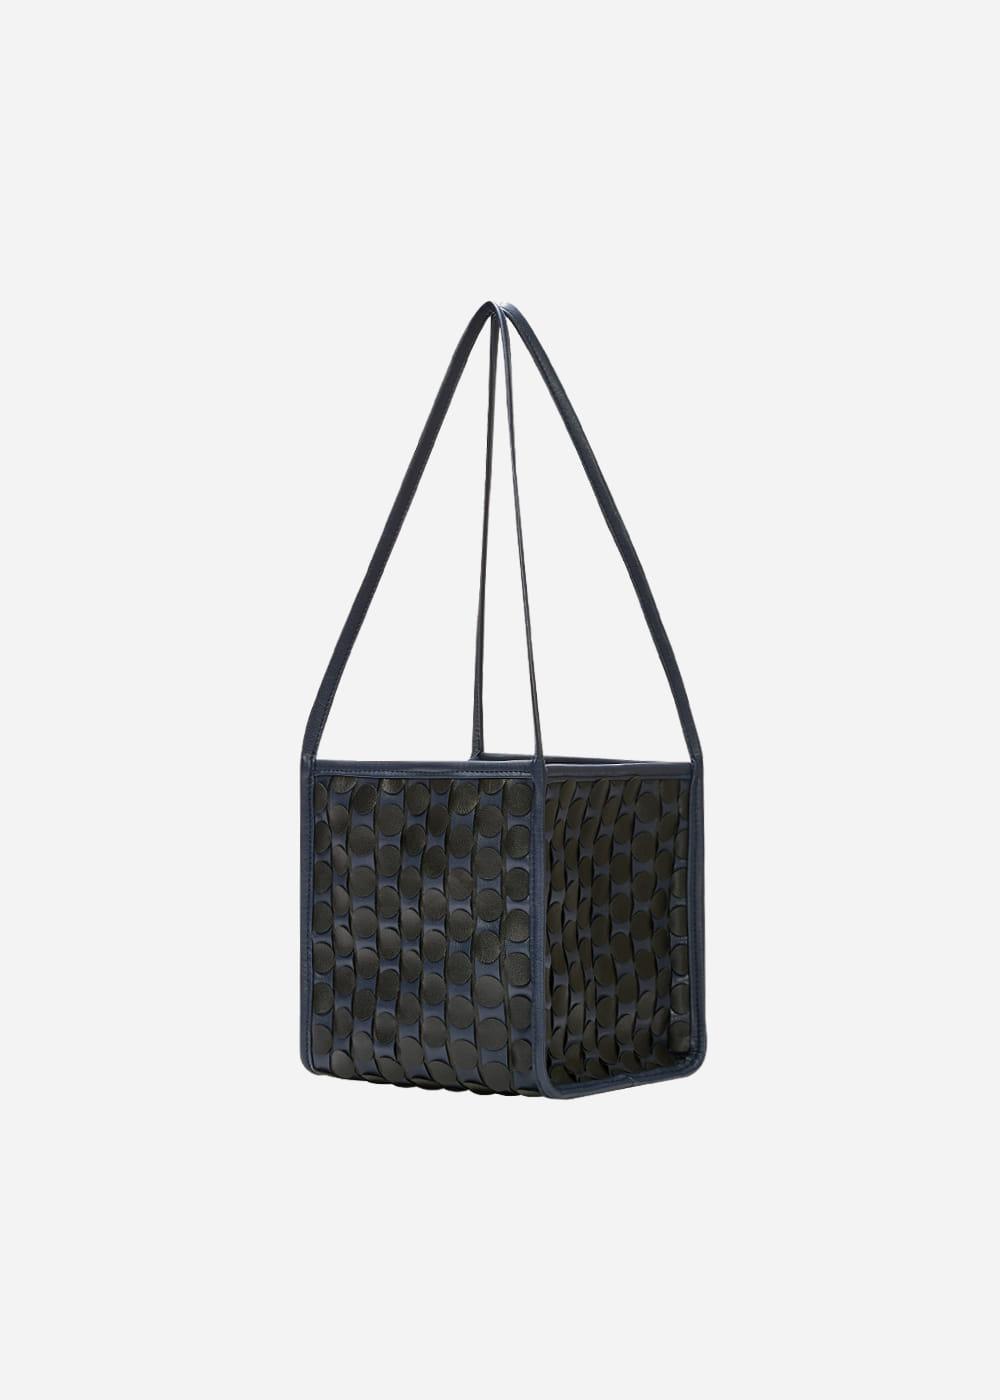 0917 Handmade Weaving Tote Medium NB